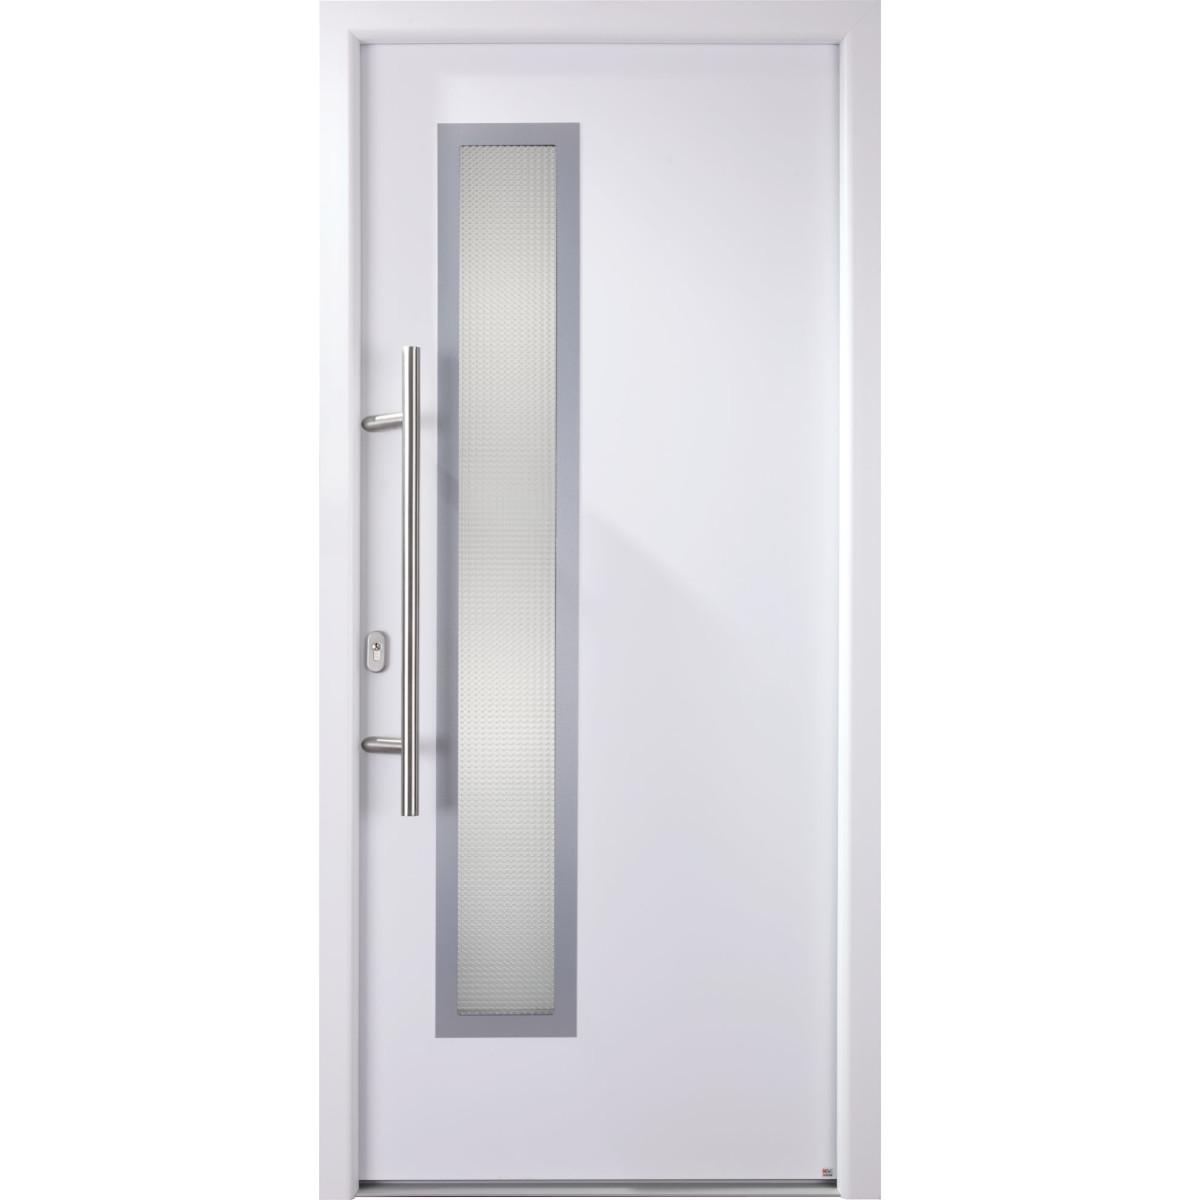 Hochwertige Energiespar Aluminium Haustur Modell Jwc03 Farbe Bei